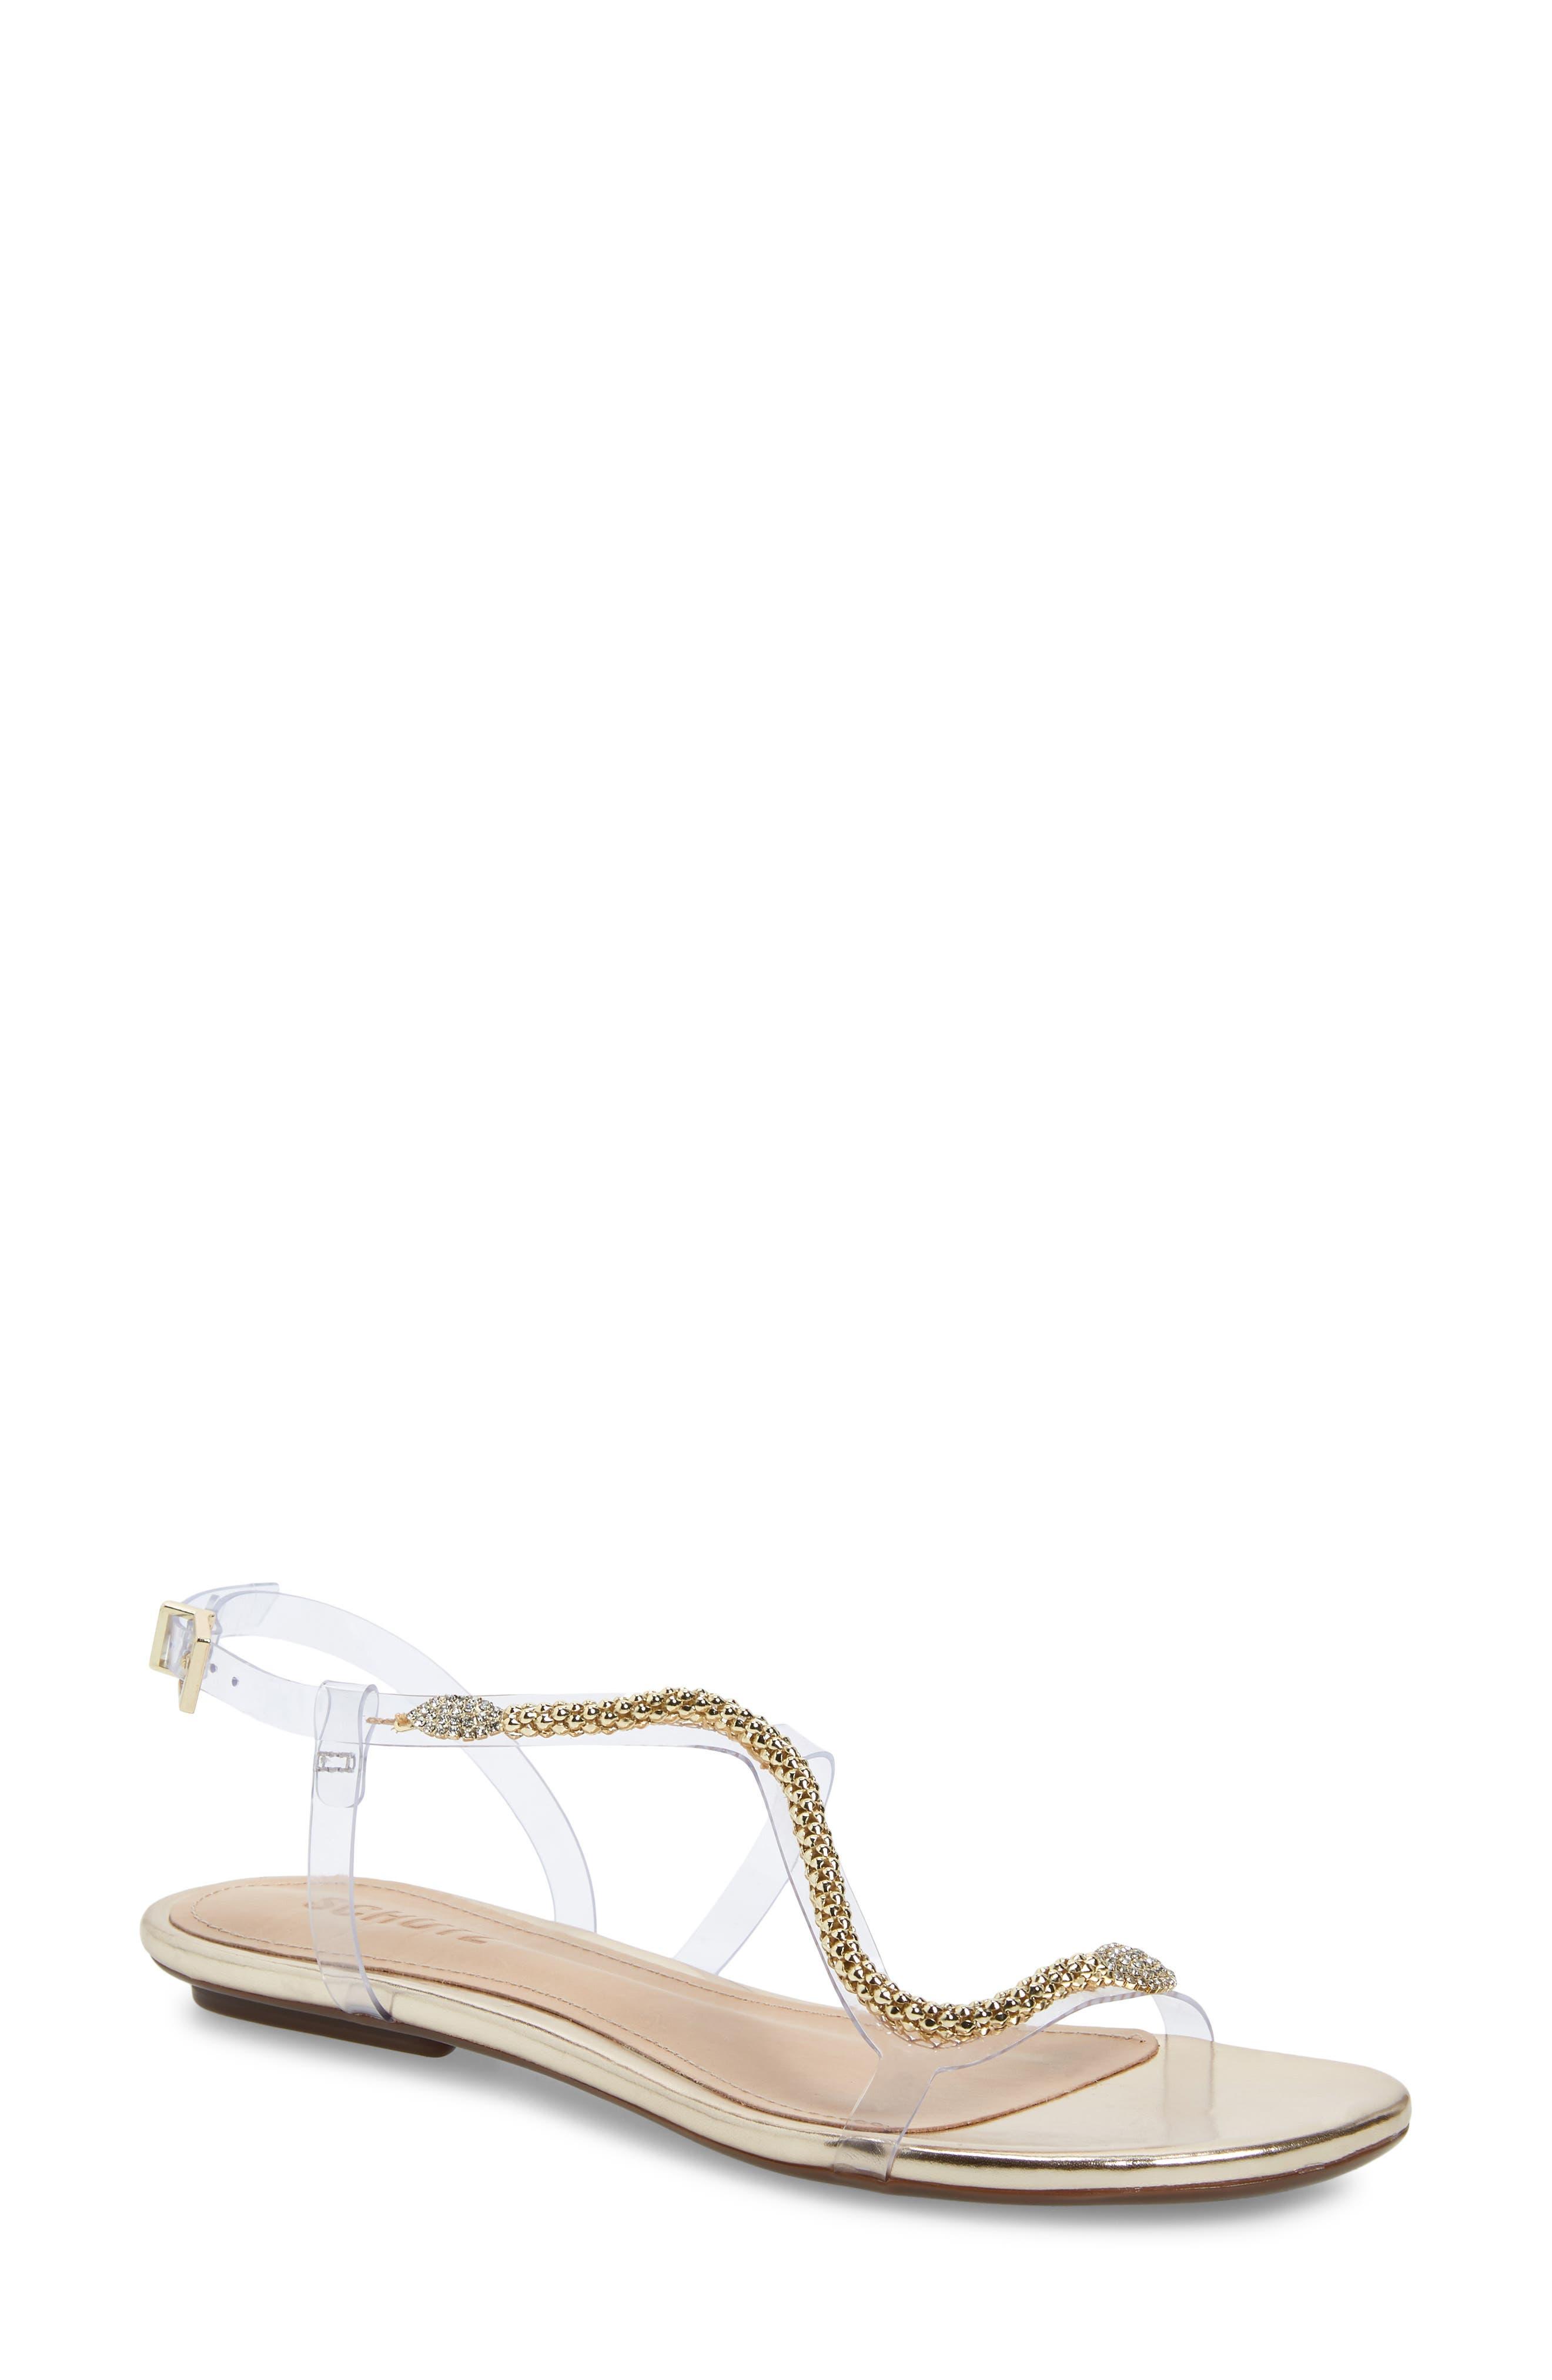 Schutz Gabbyl Embellished Sandal, Beige